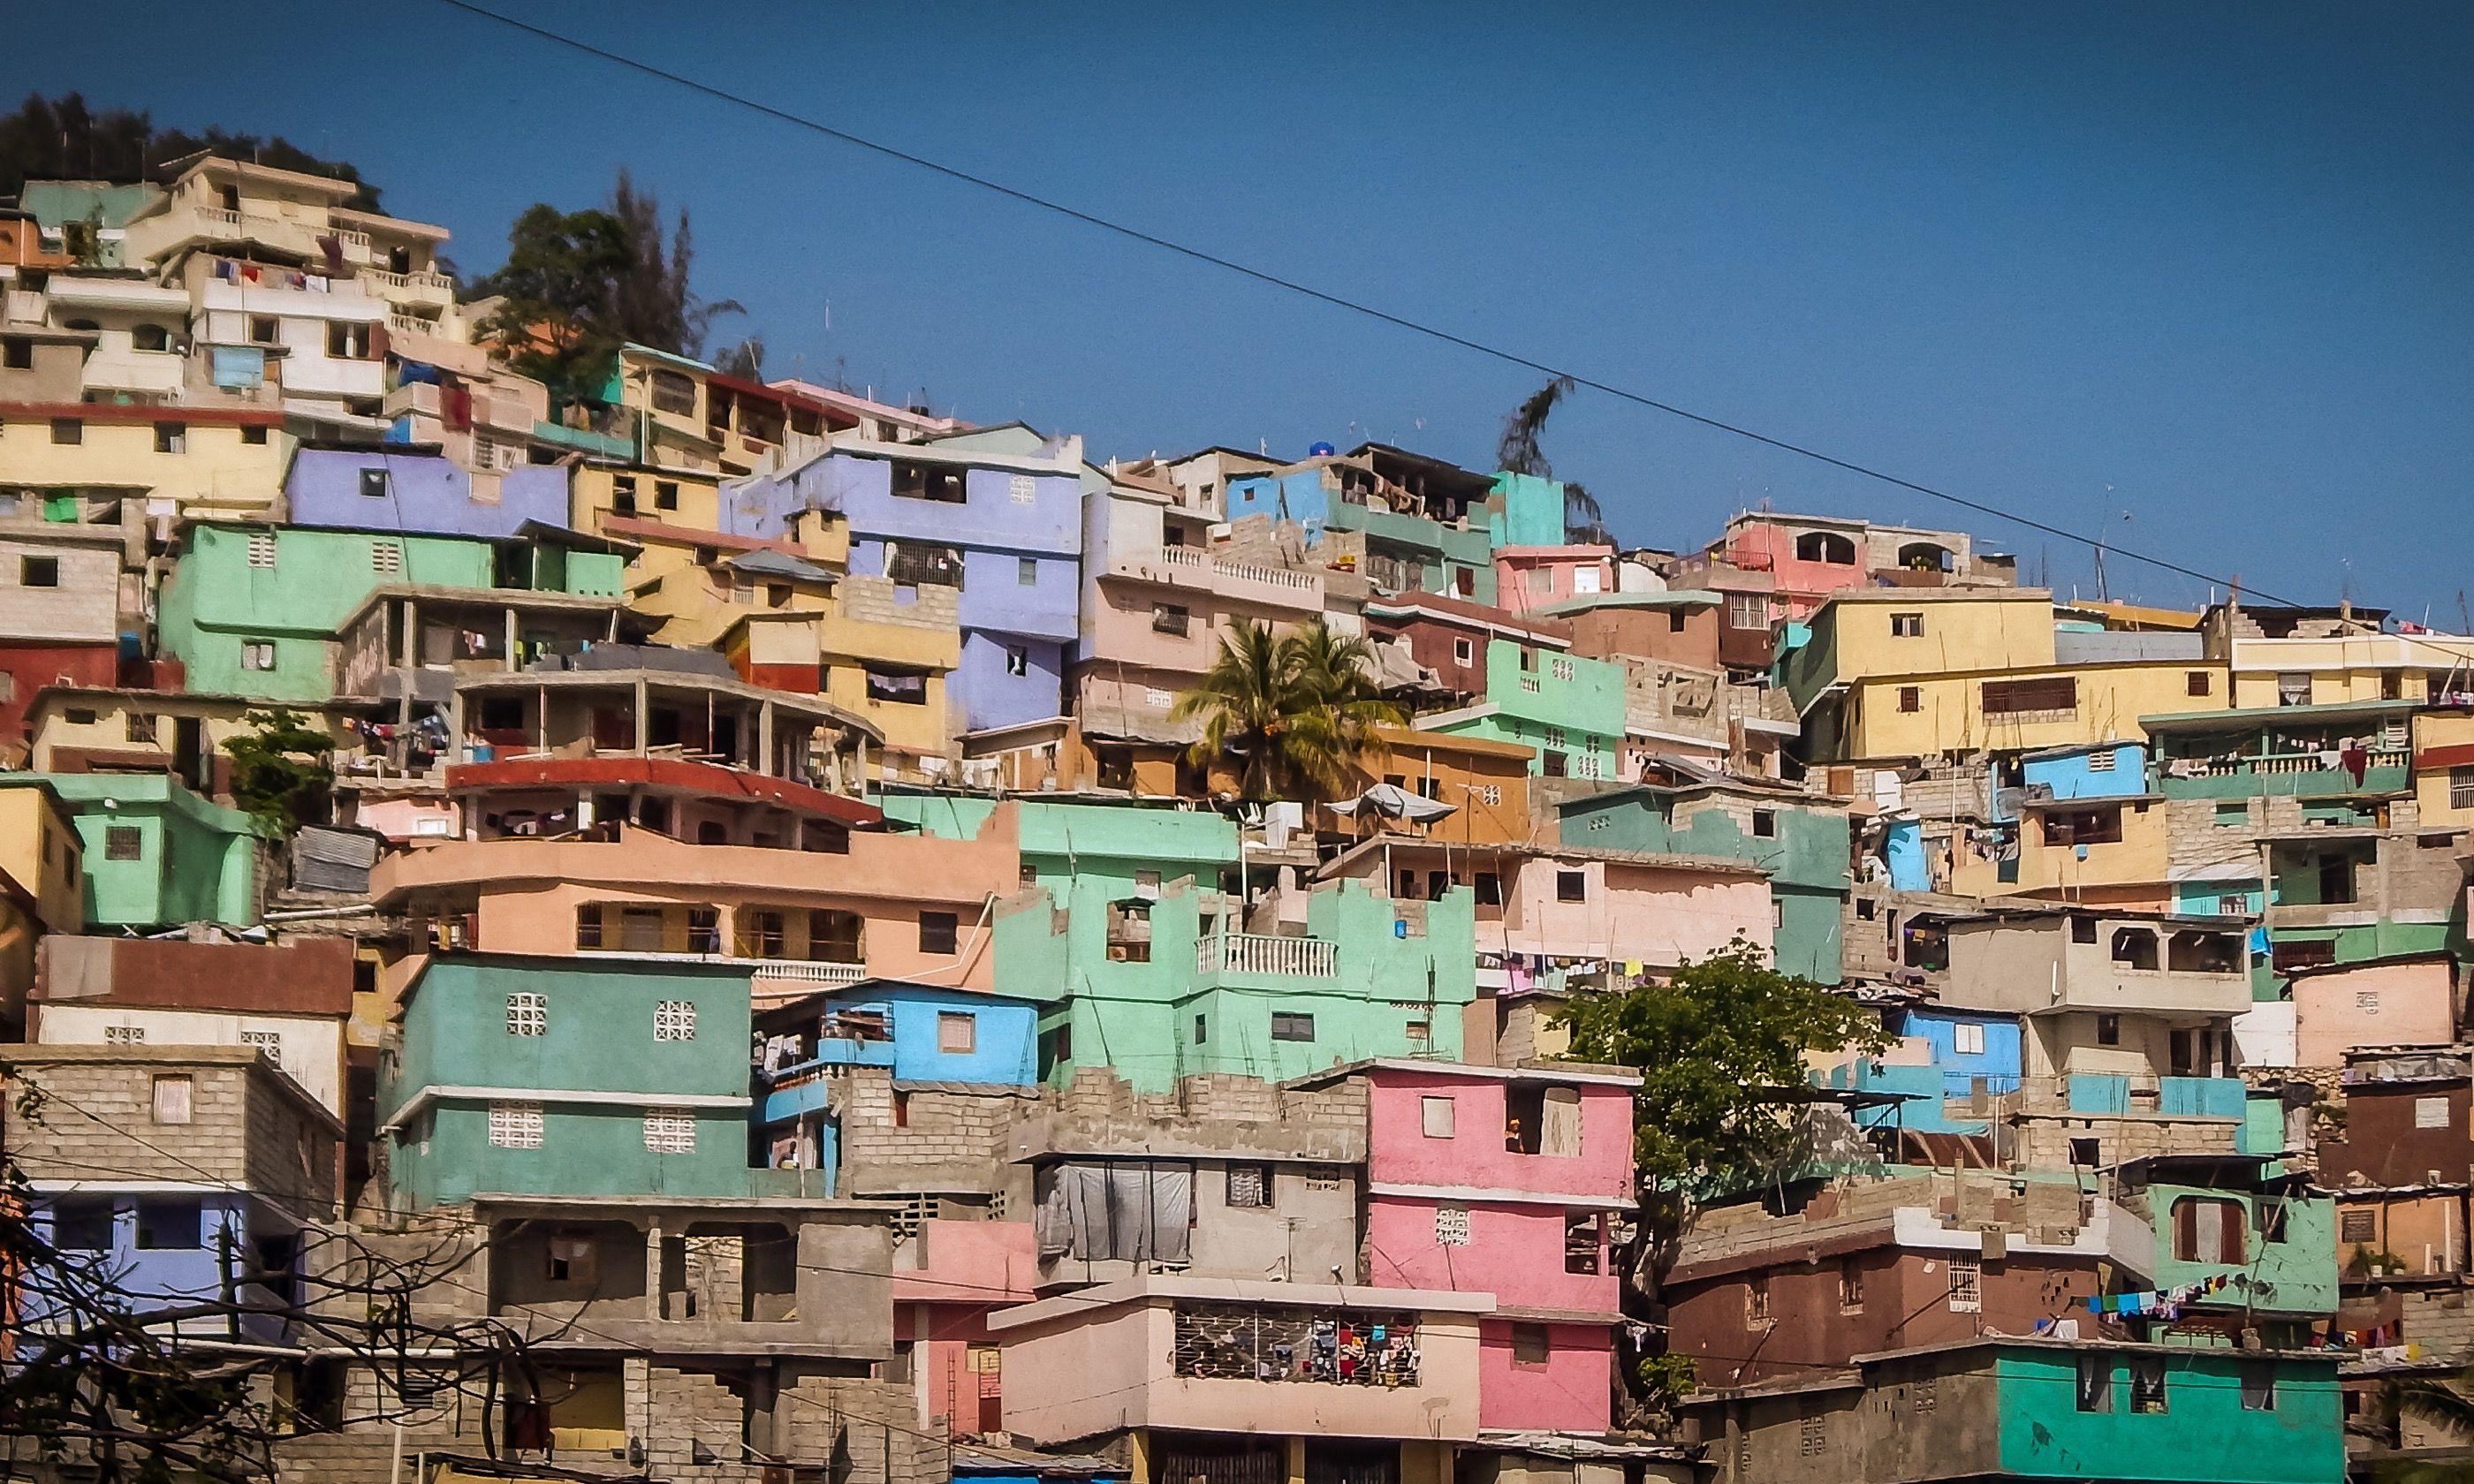 Hillside in Port-au-Prince, Haiti (Dreamstime)